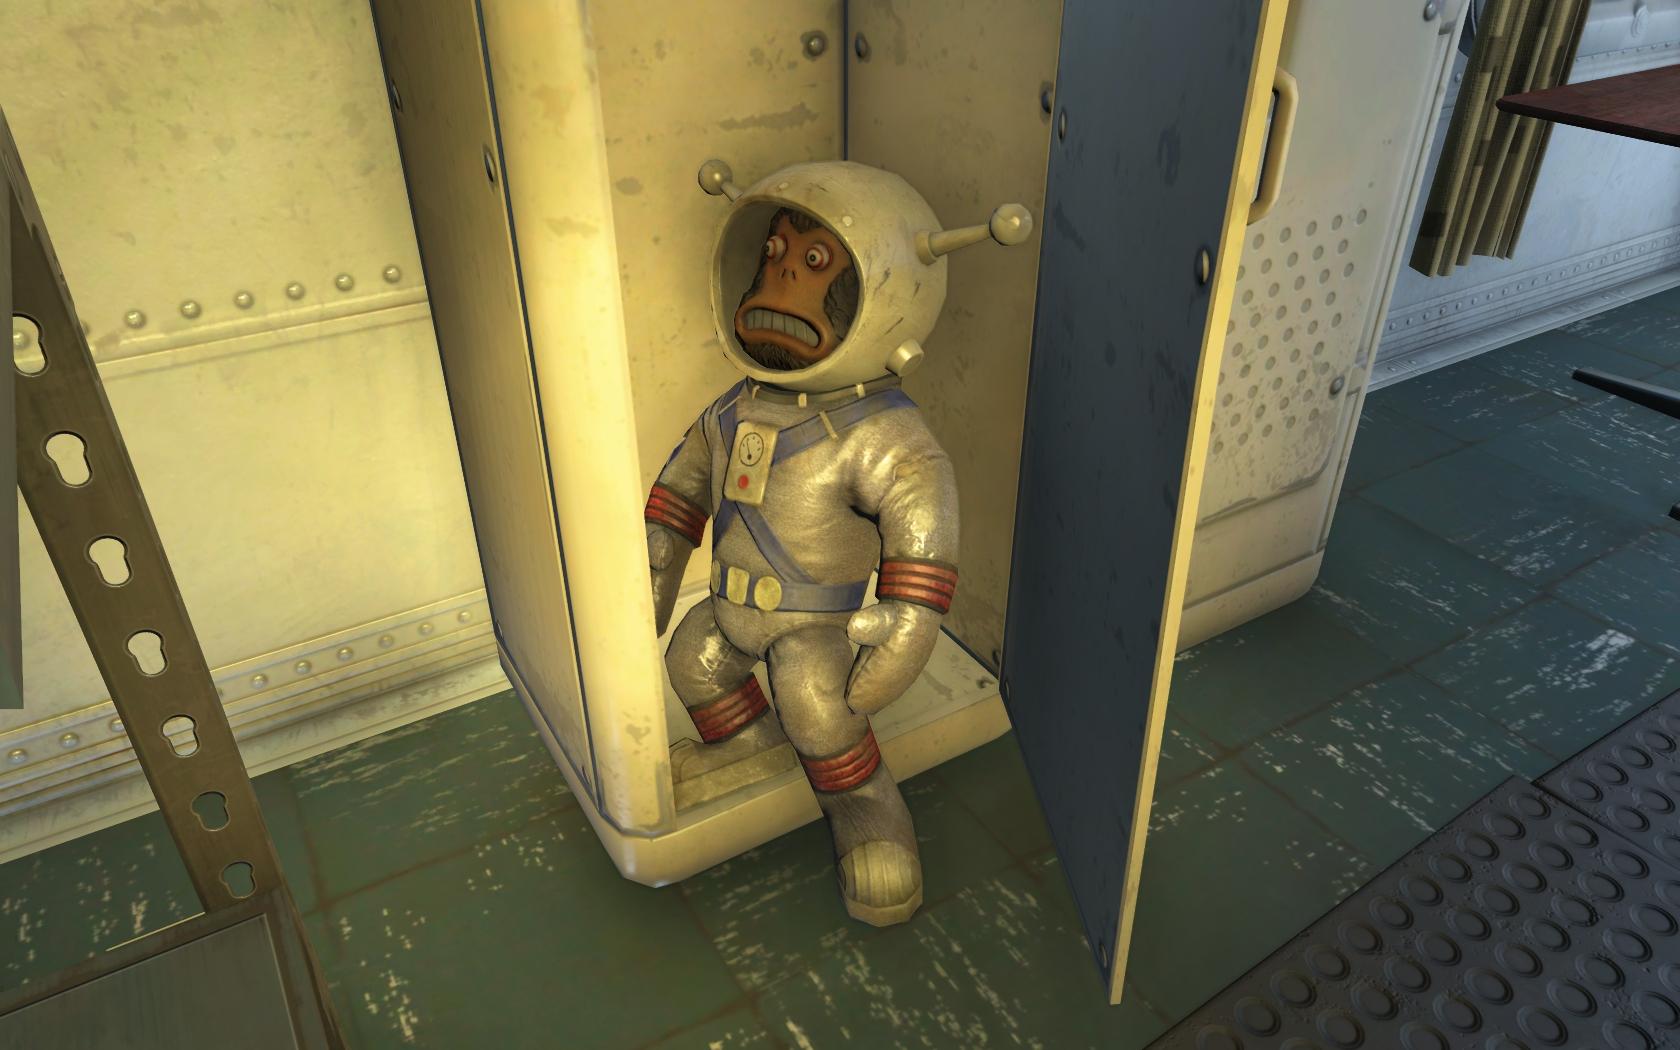 Дженглс (Убежище 81) - Fallout 4